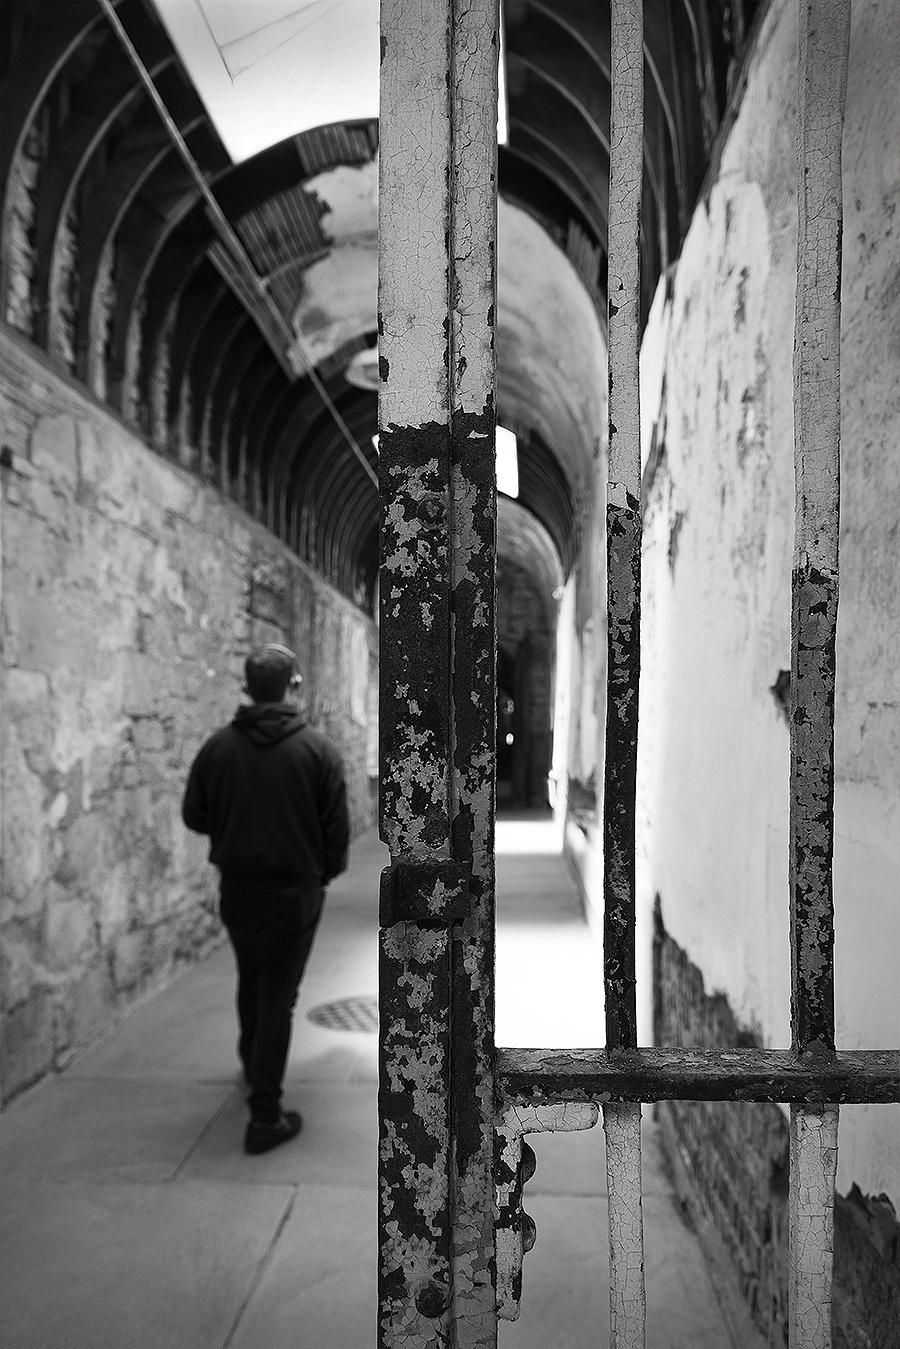 Zoe_Photography_EasternStatePenitentiary_Philadelphia_TheLostPast_WalkingIntoThePain